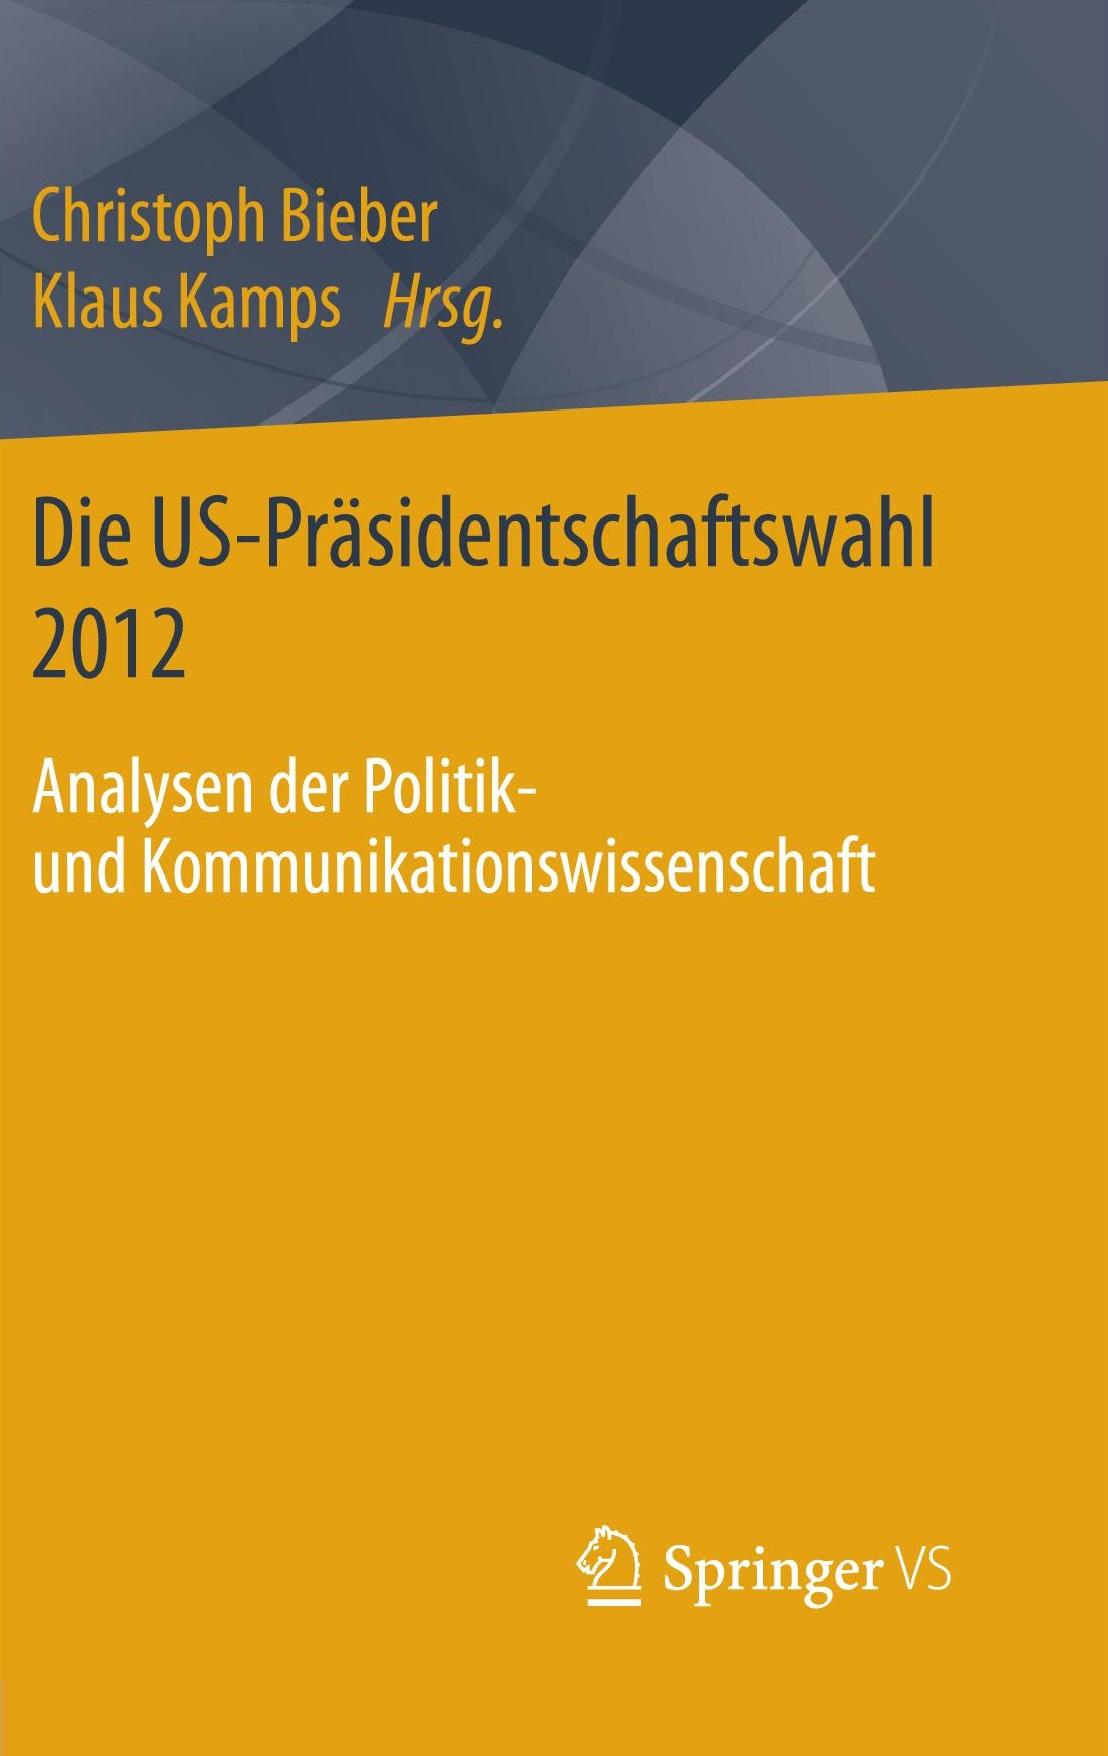 Christoph Bieber/Klaus Kamps (Hrsg.): Die US-Präsidentschaftswahl 2012.